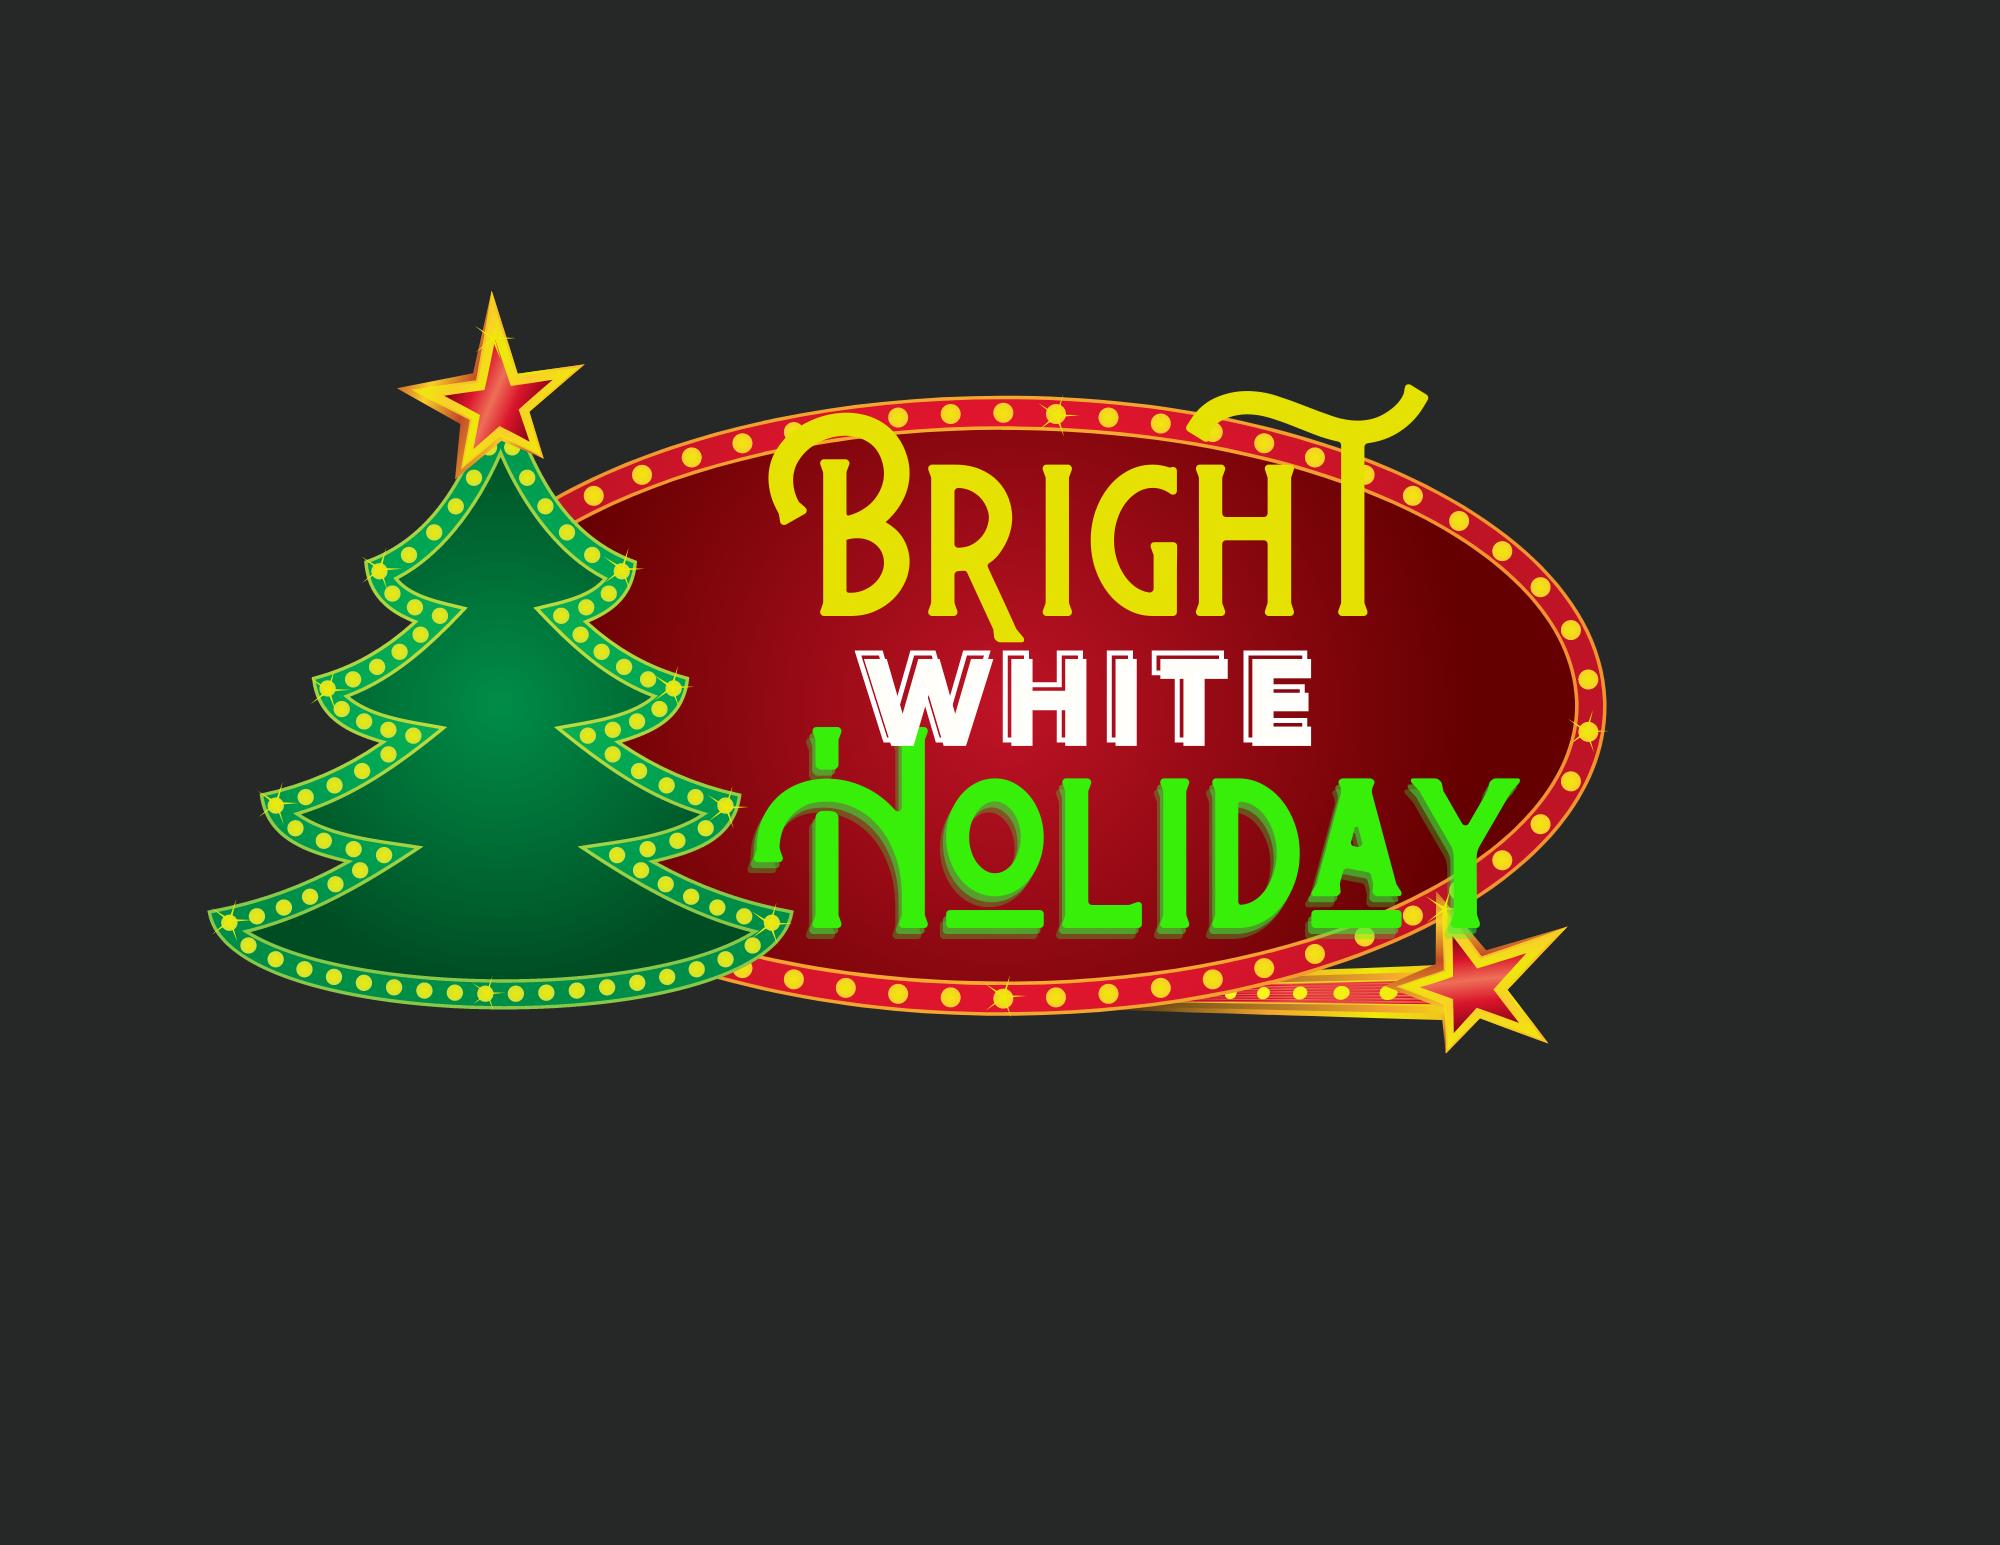 Bright White Holiday